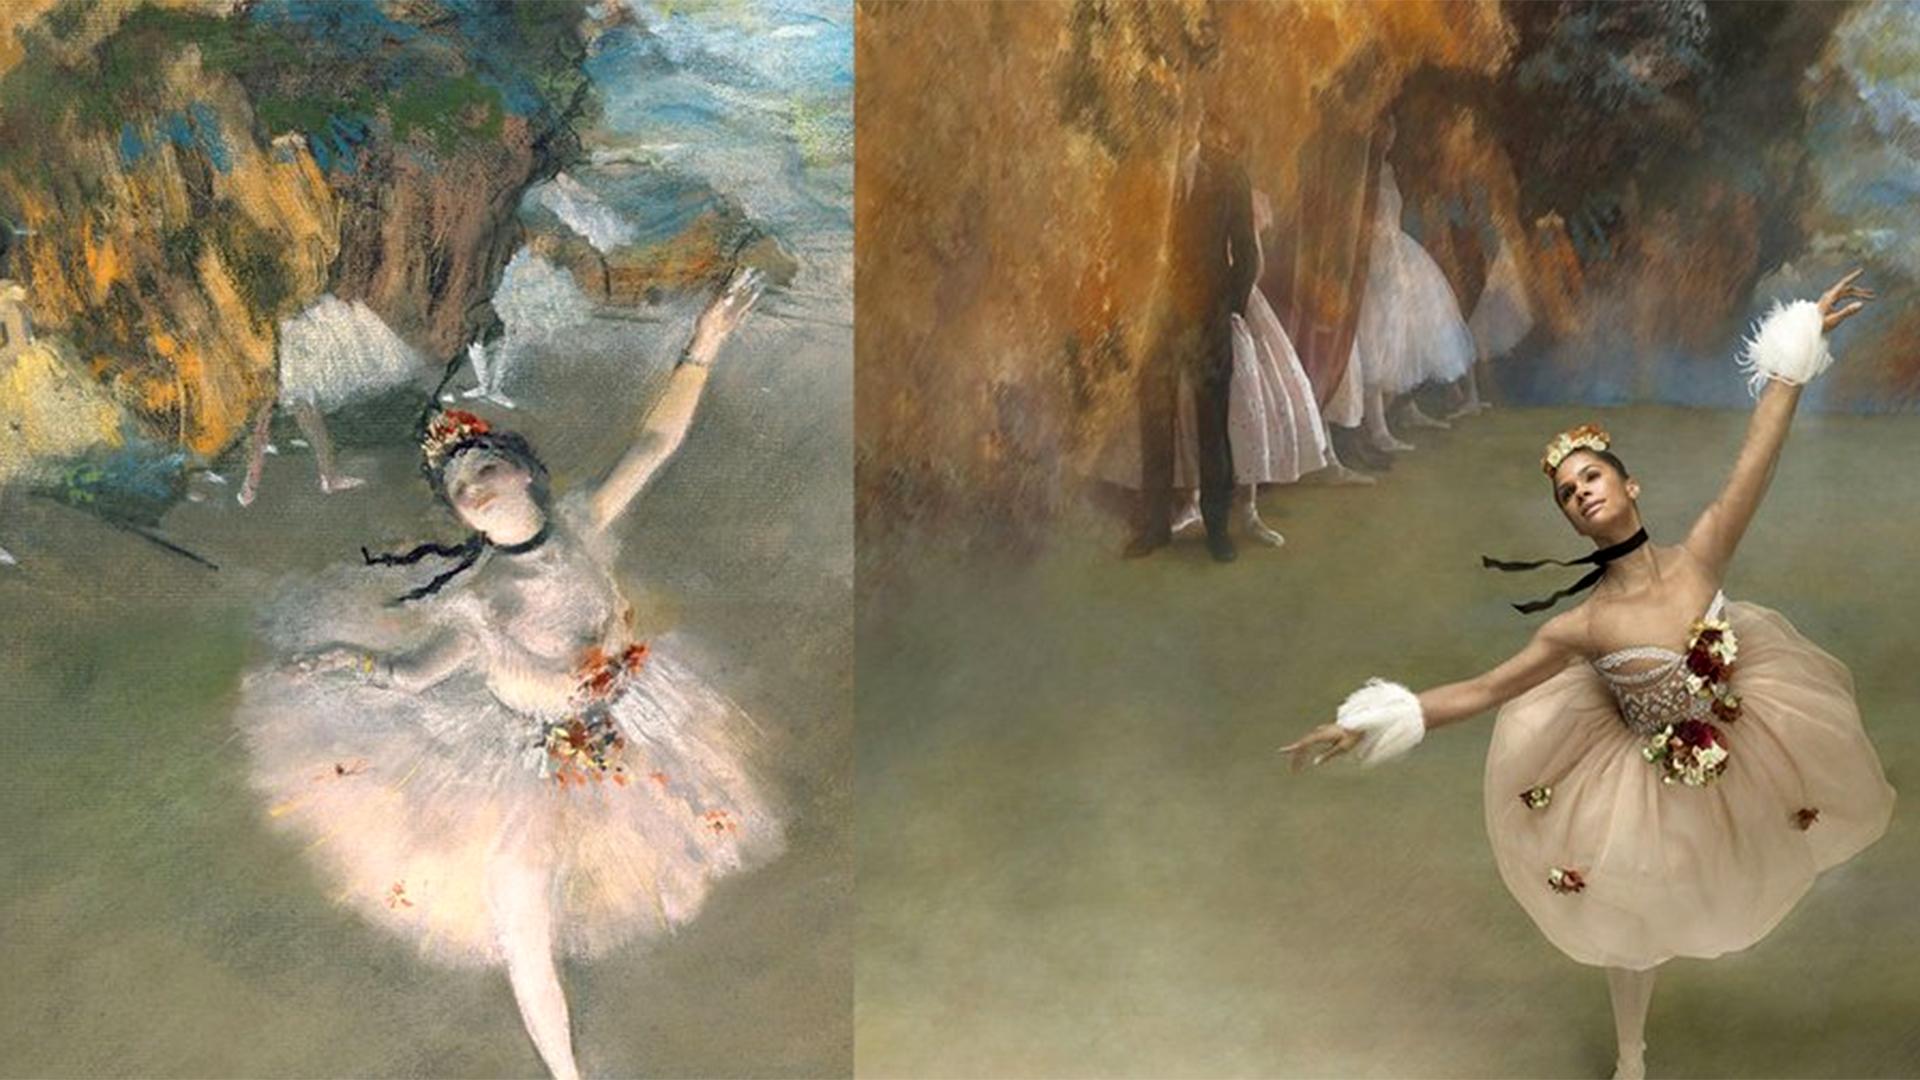 Ballet Dance Wallpapers Hd Resolution Dodskypict: On Pointe! Ballerina Misty Copeland Re-creates Degas